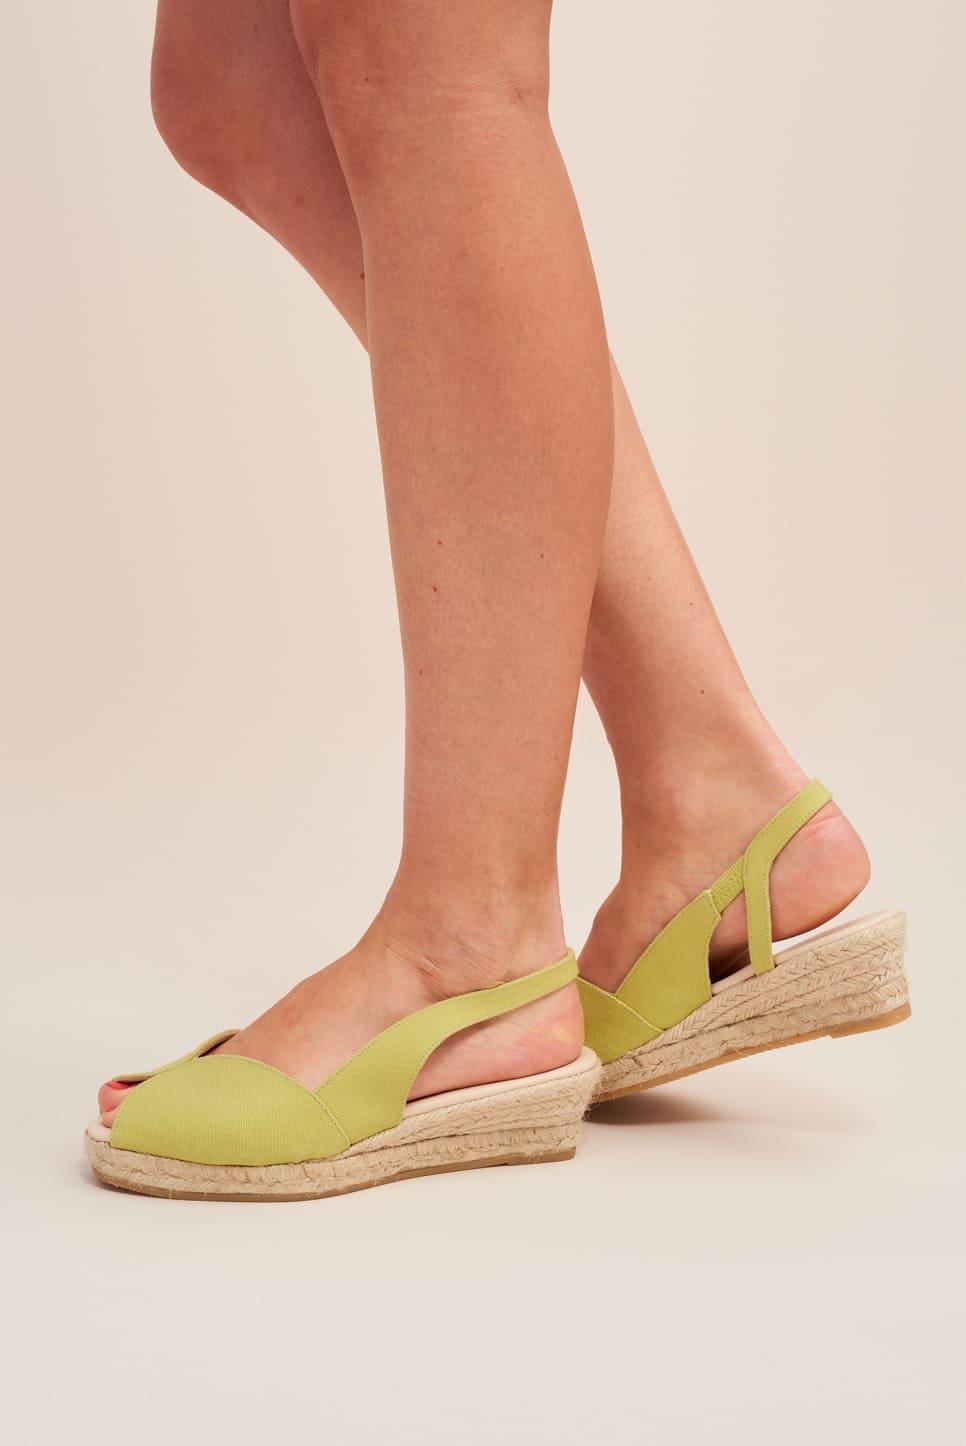 JOSEPHA wedged sandals